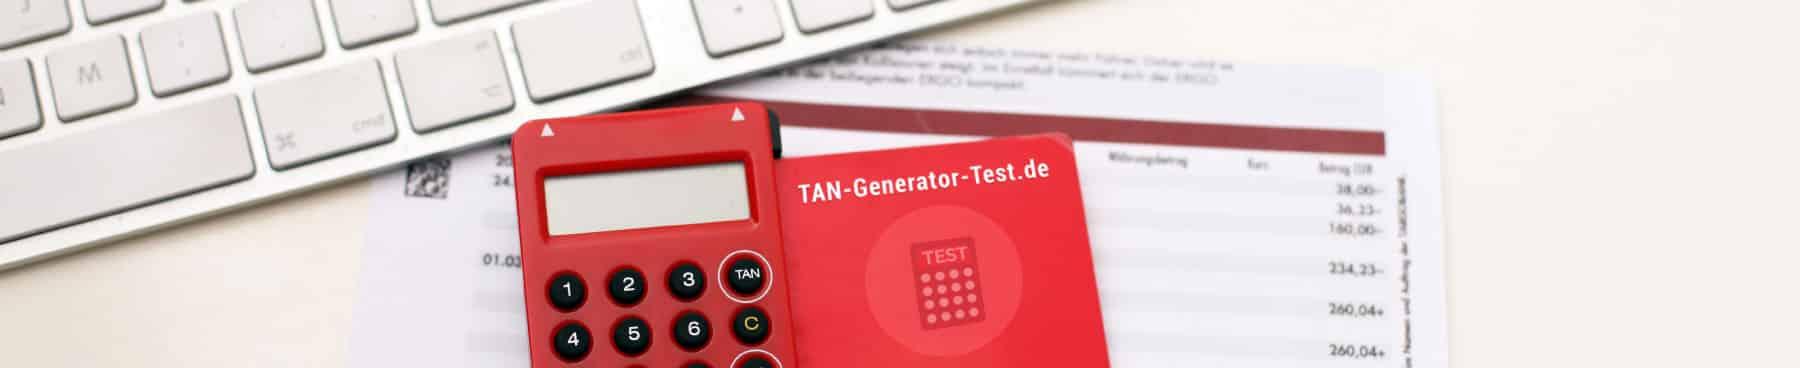 tan-generator-test-header